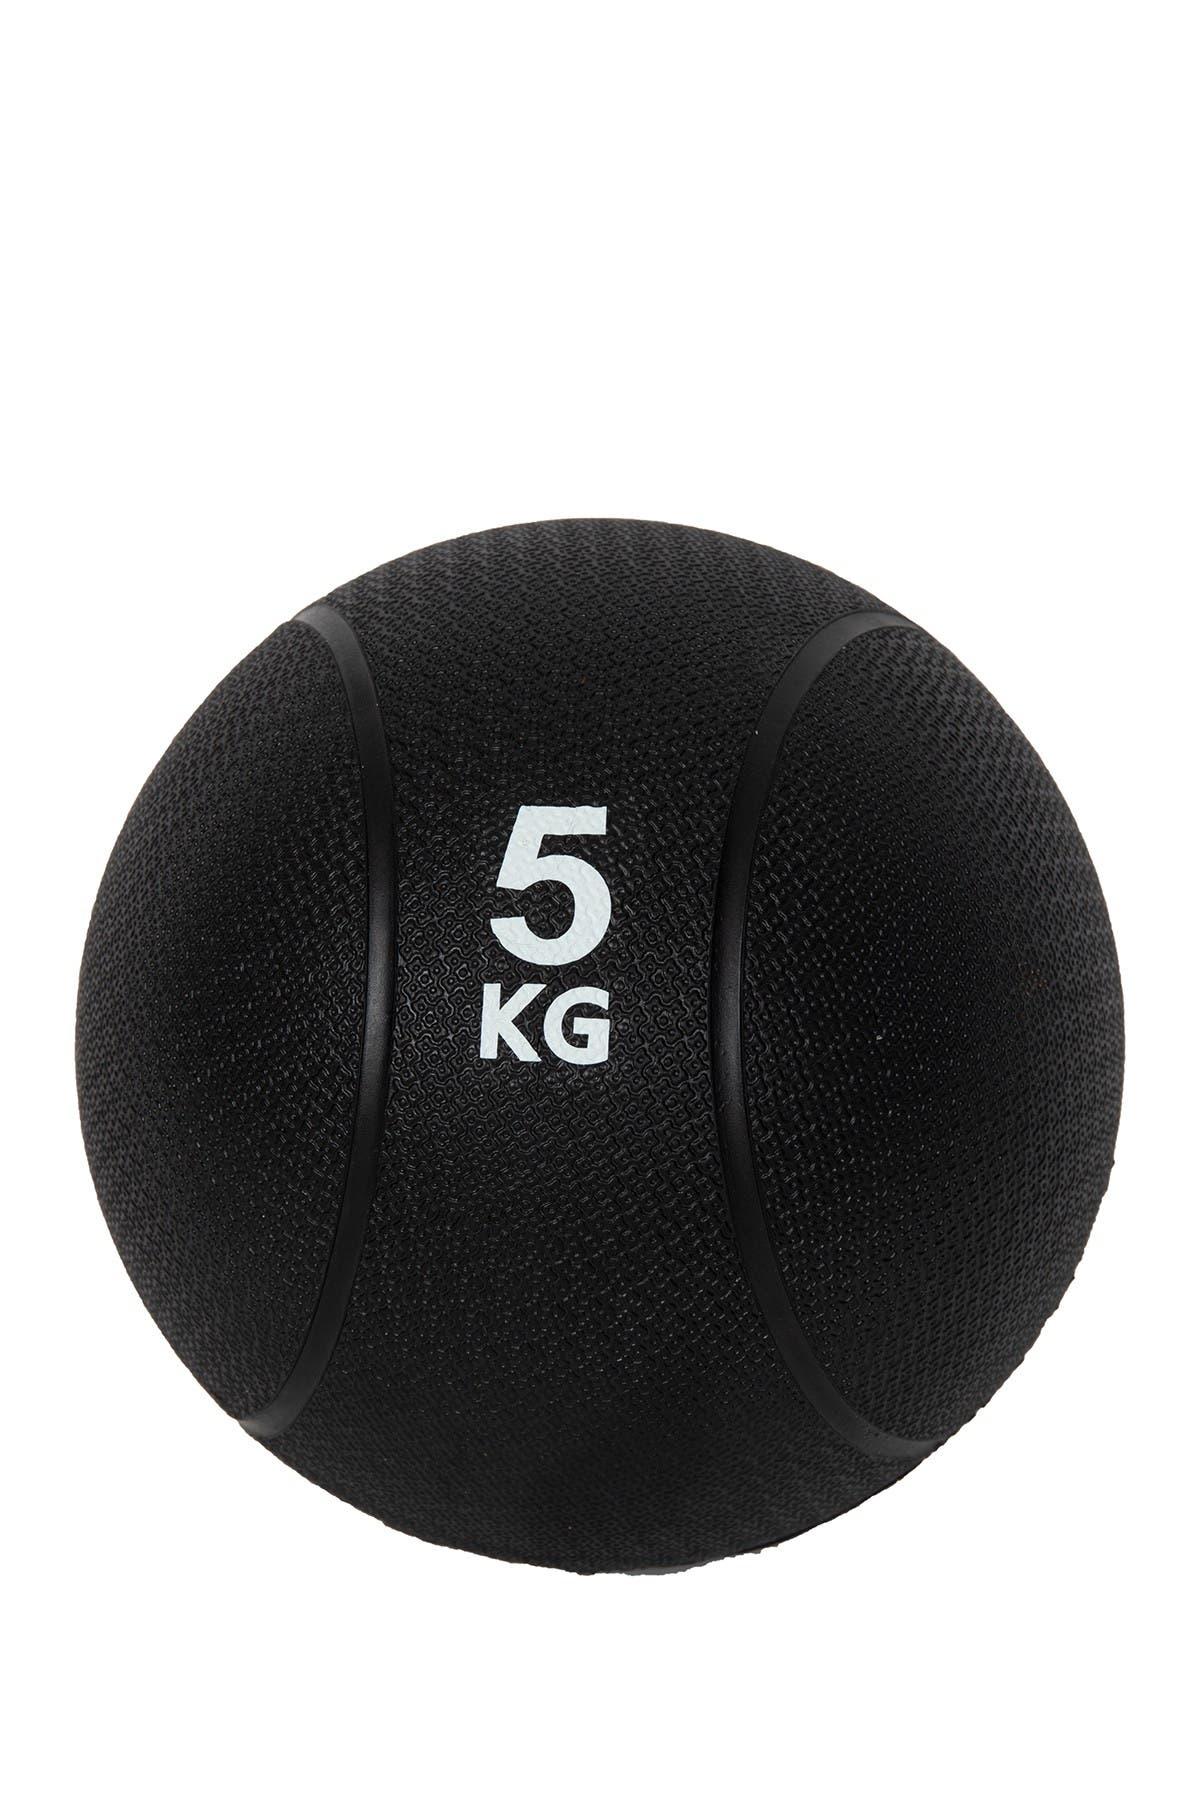 Image of MIND READER Core Workout Medicine Ball - 11 lb.